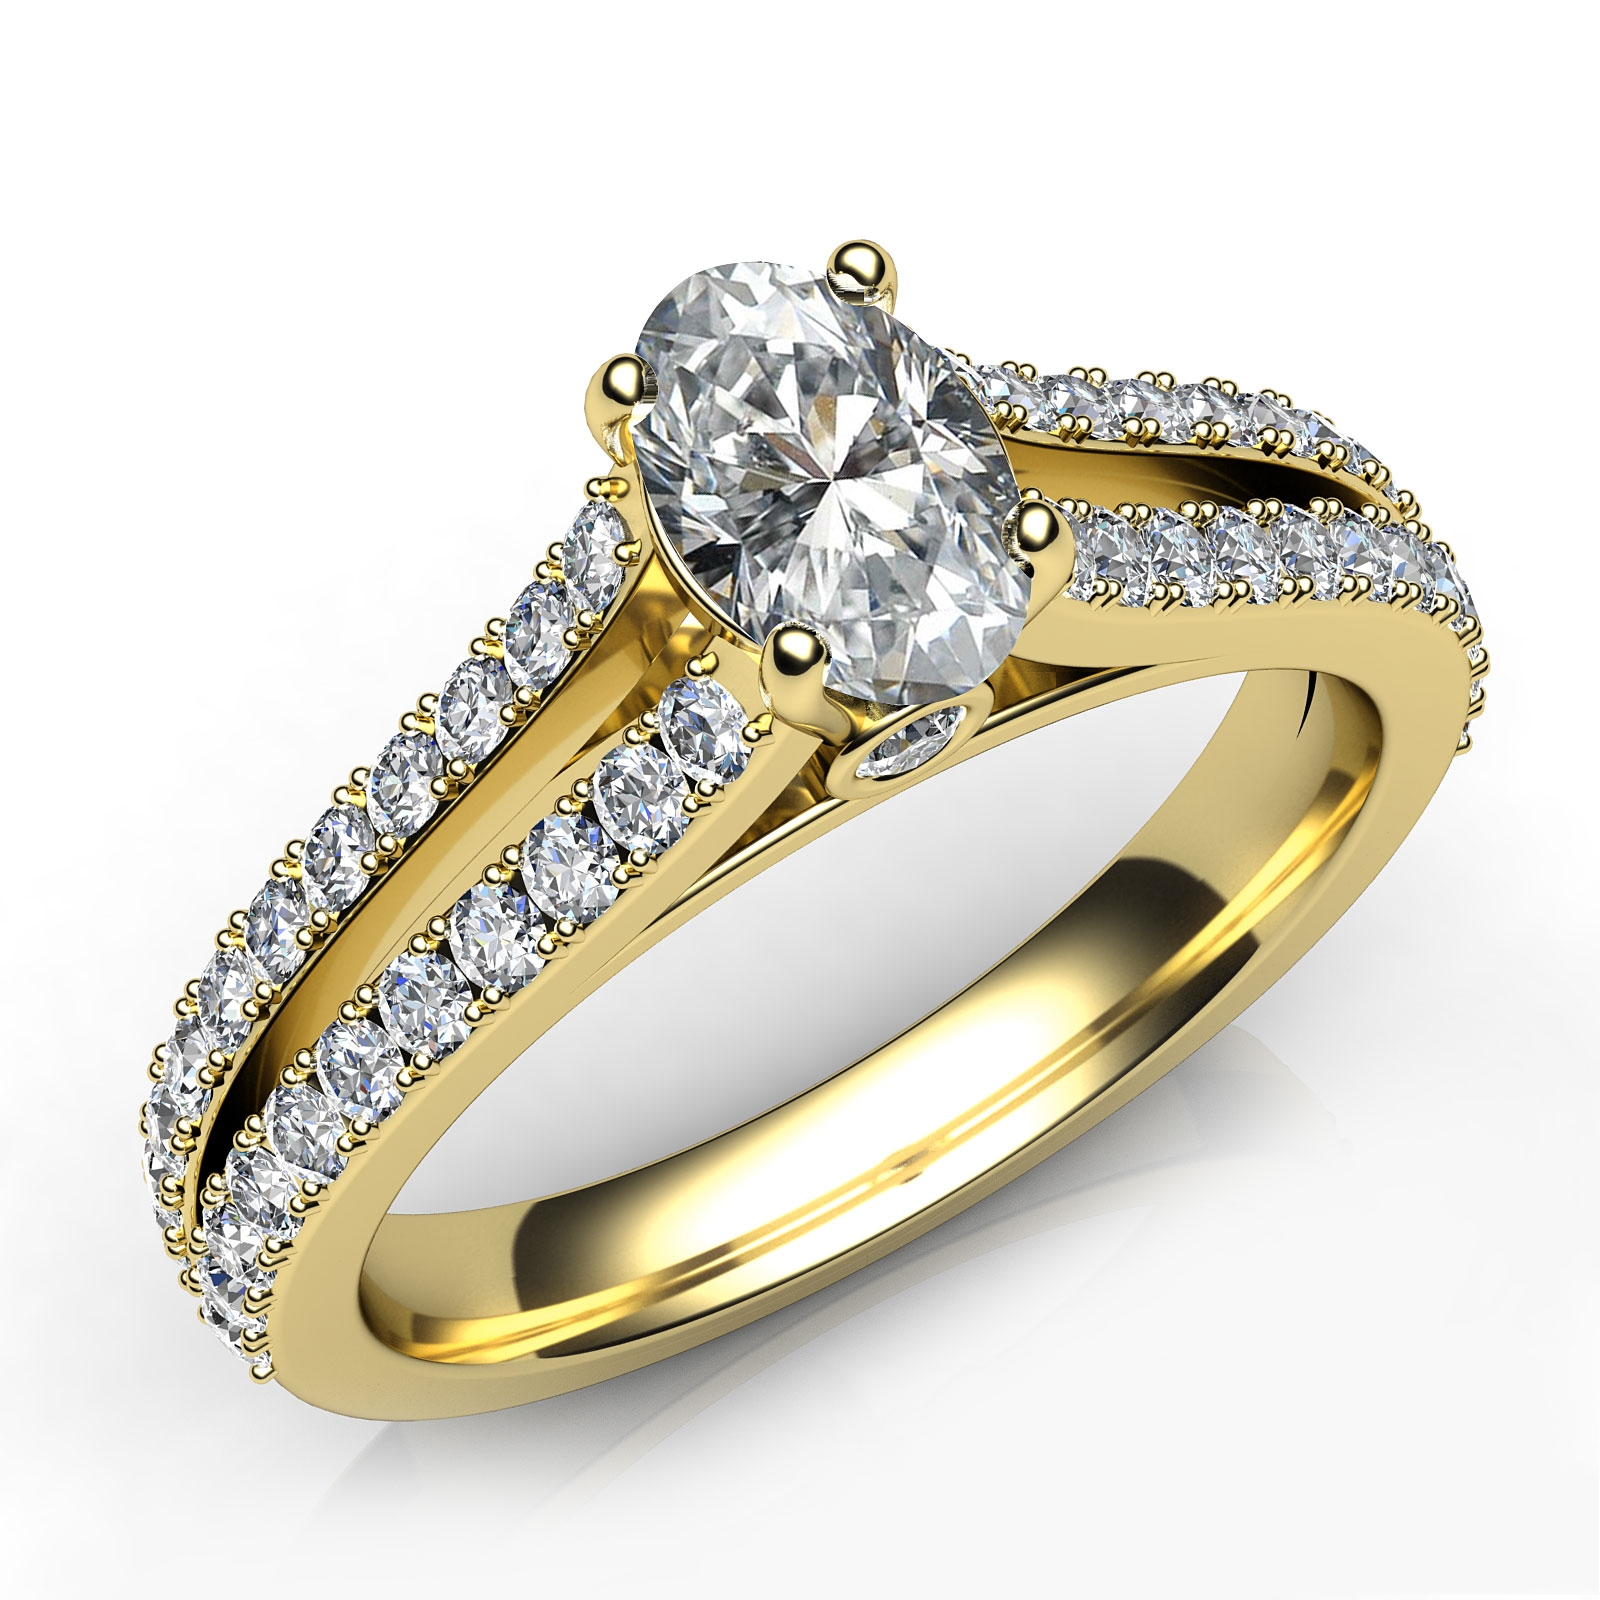 Split Shank Oval Diamond Engagement Ring GIA D Color VVS1